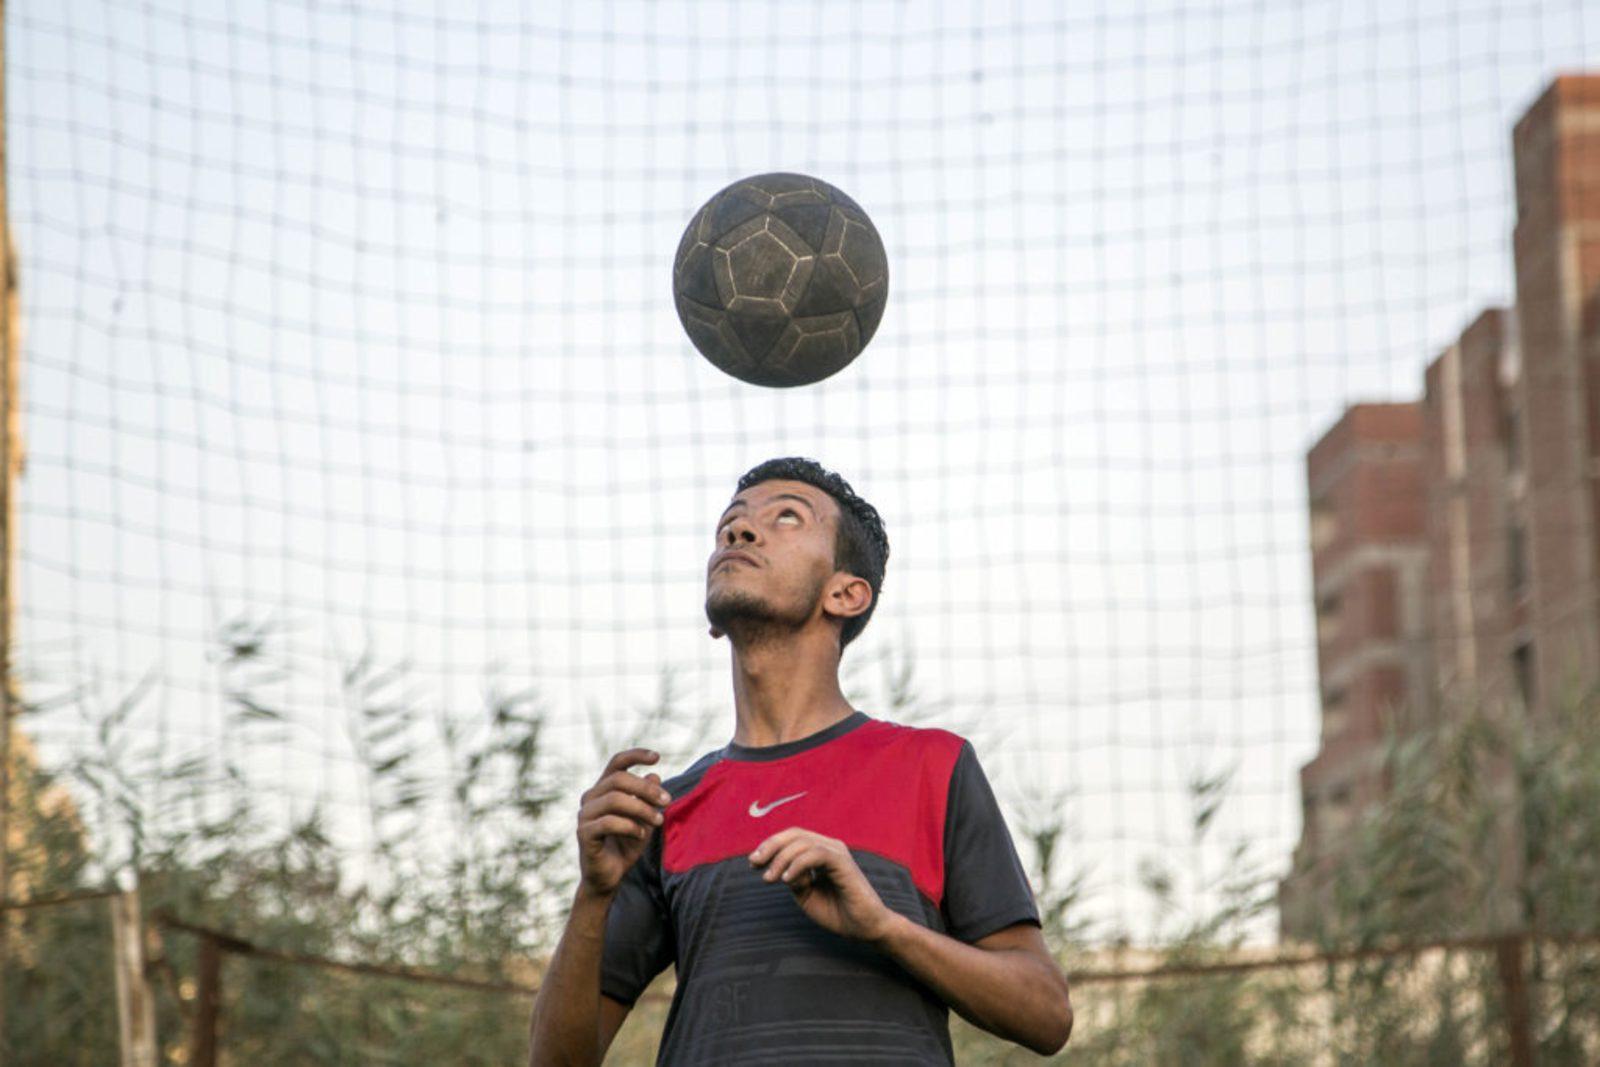 20180619-Egypte-discriminatie-voetballers-Mina-Halim